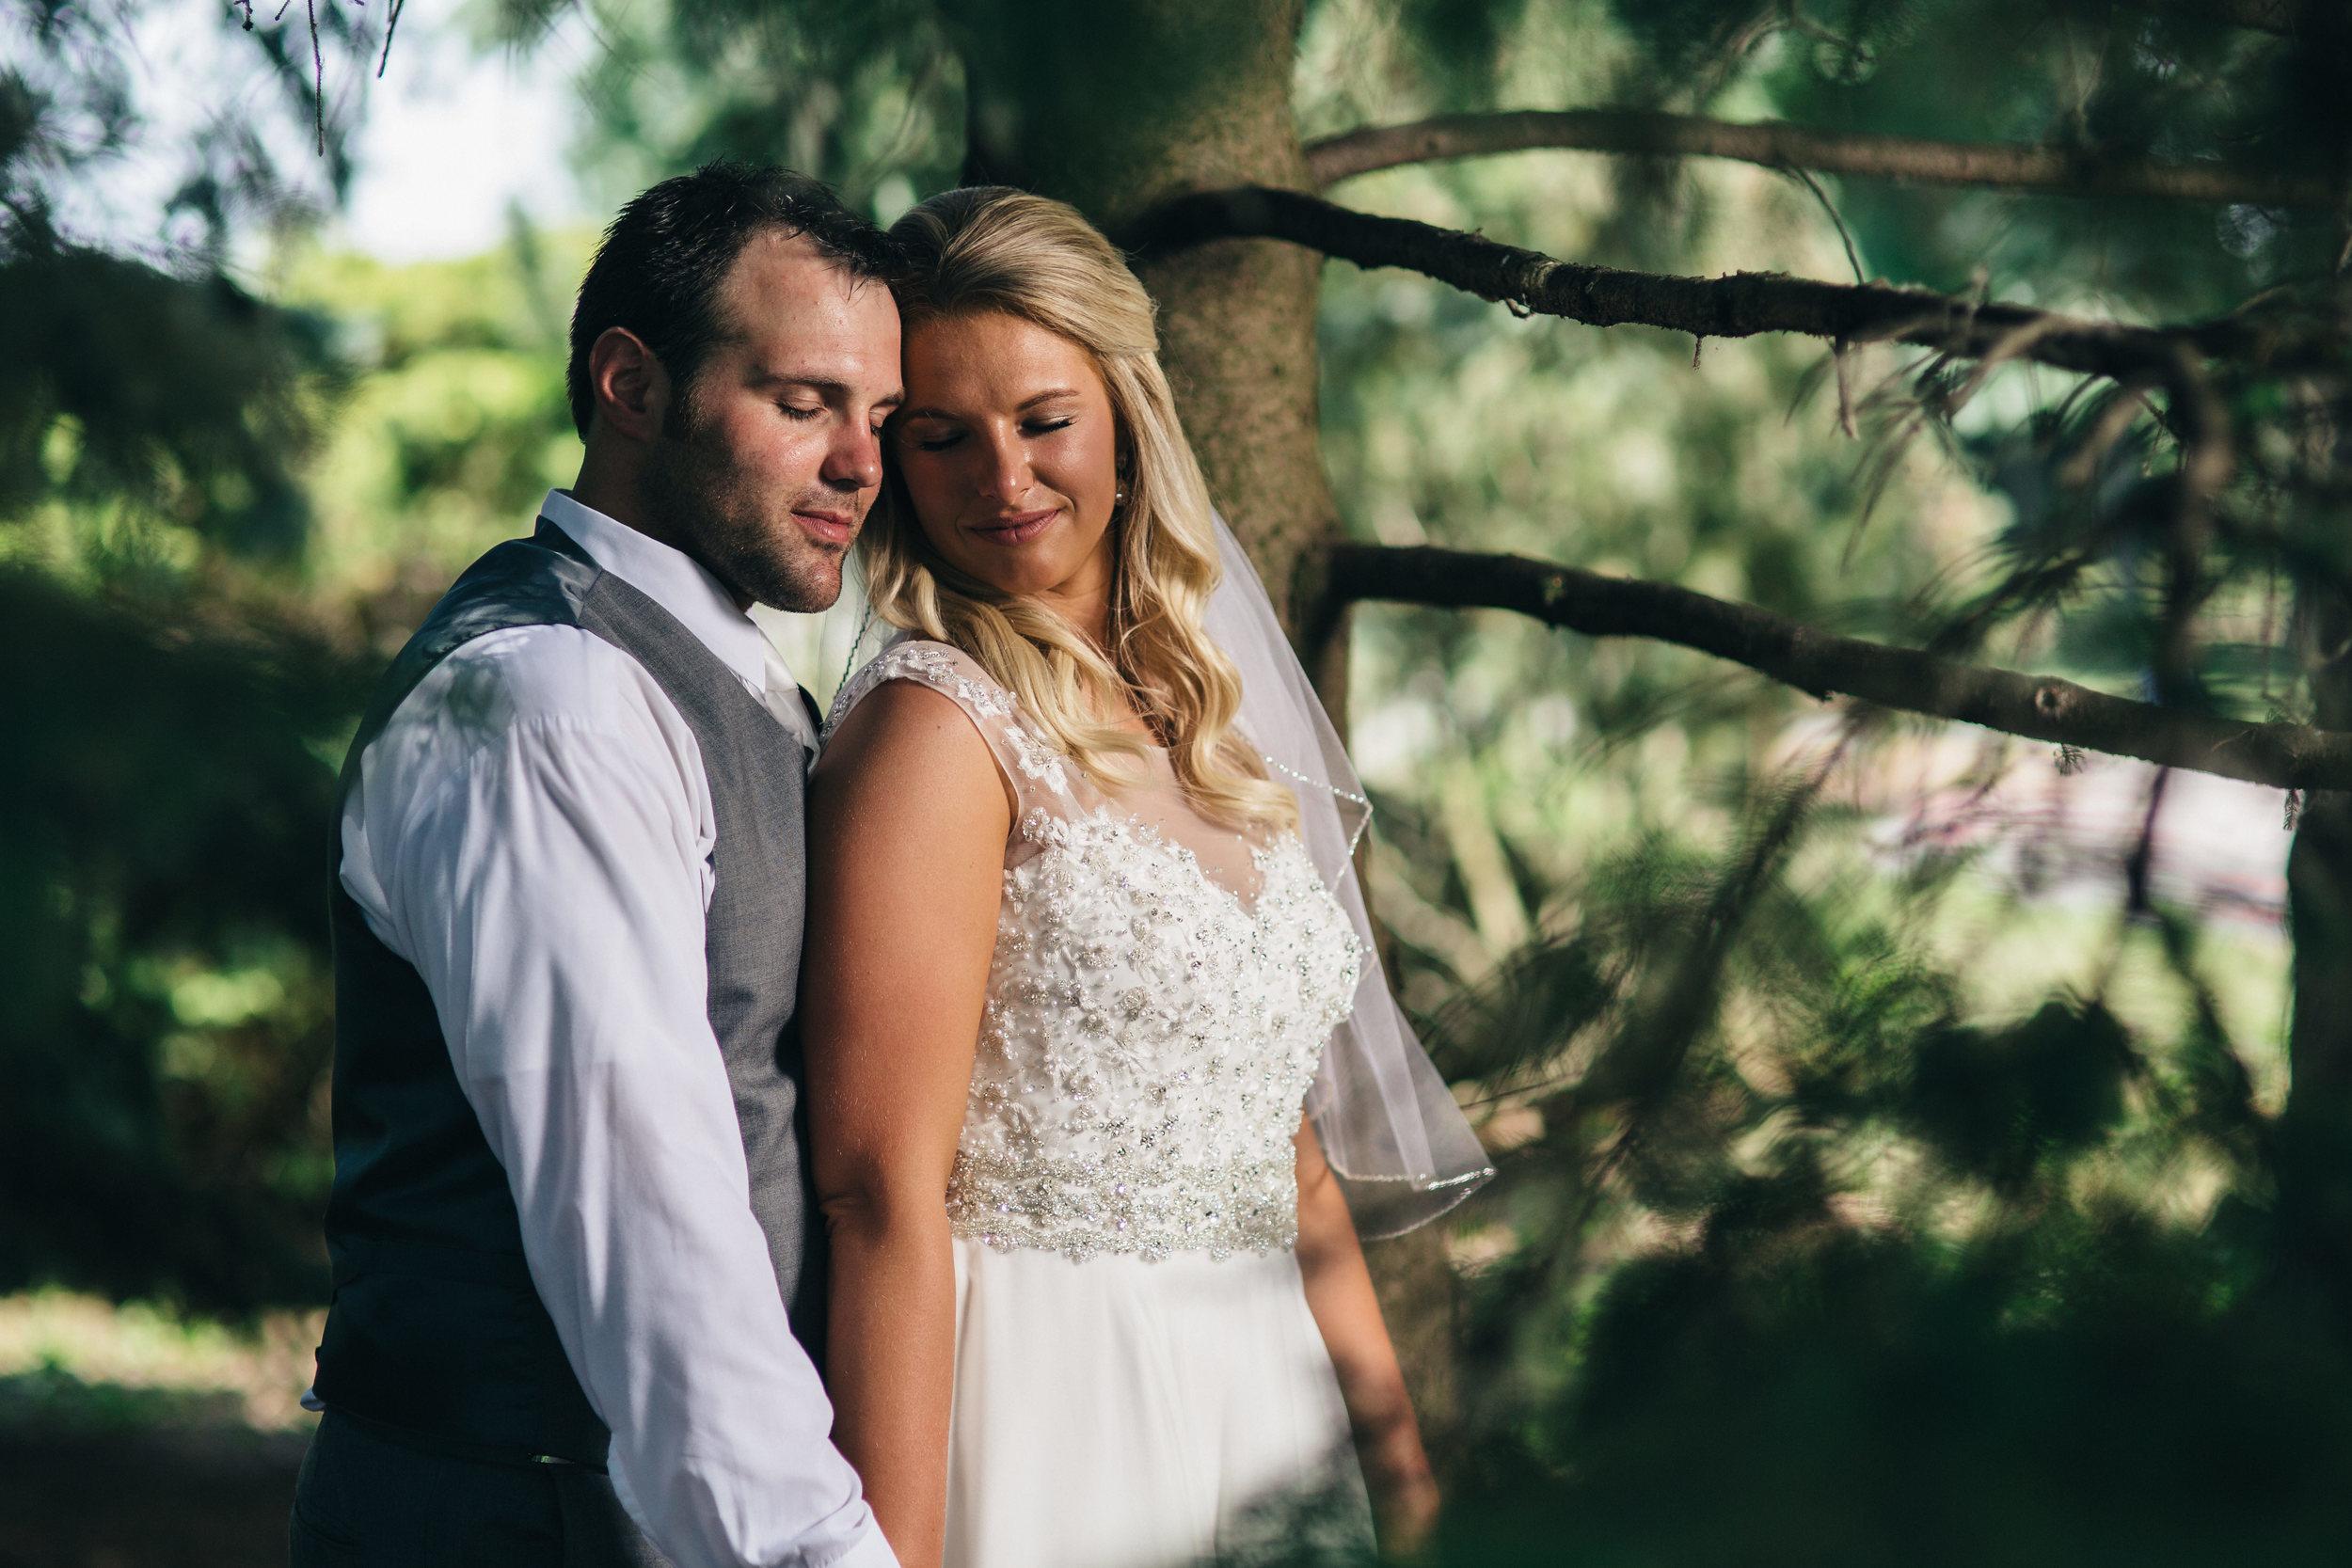 Wedding photography in Toledo, Ohio.